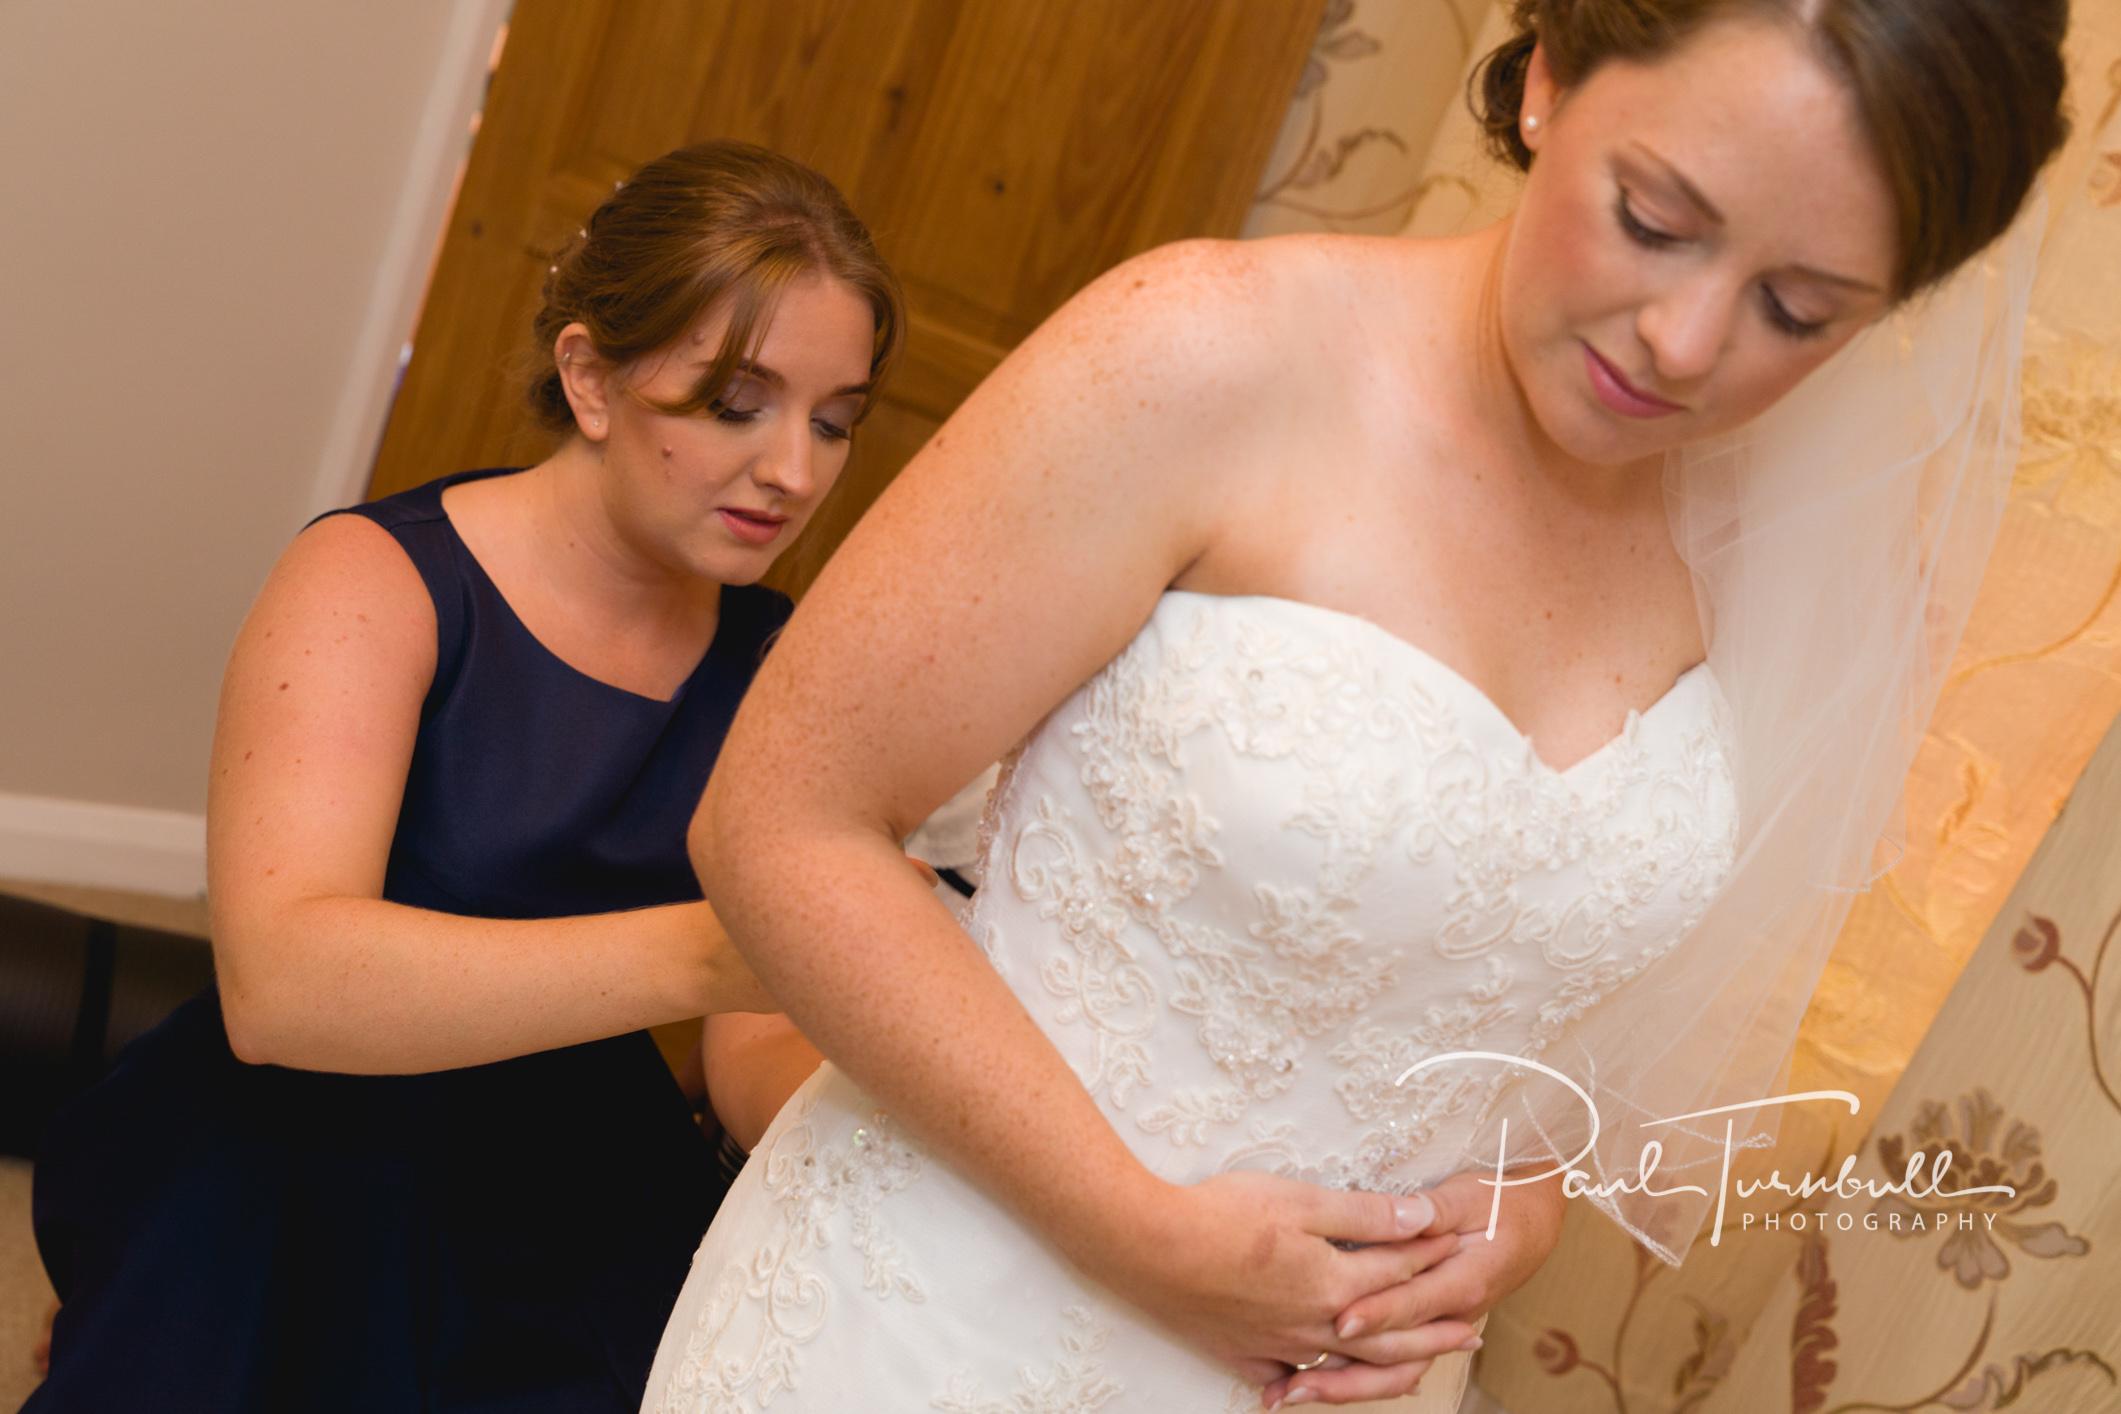 wedding-photographer-south-dalton-walkington-yorkshire-emma-james-013.jpg